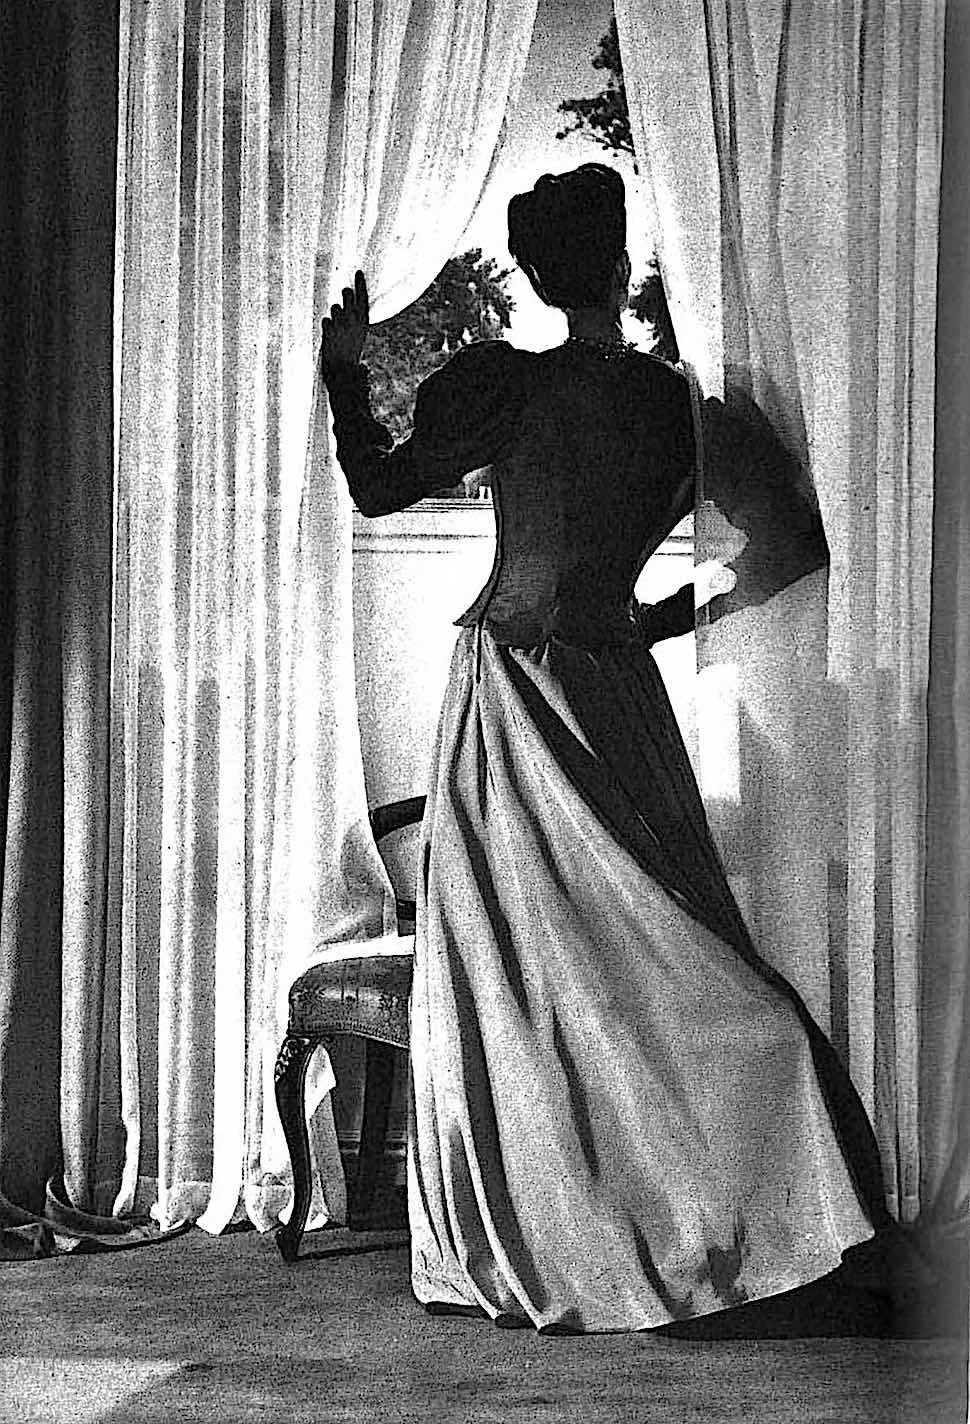 a 1941 noir photograph of a woman at a window